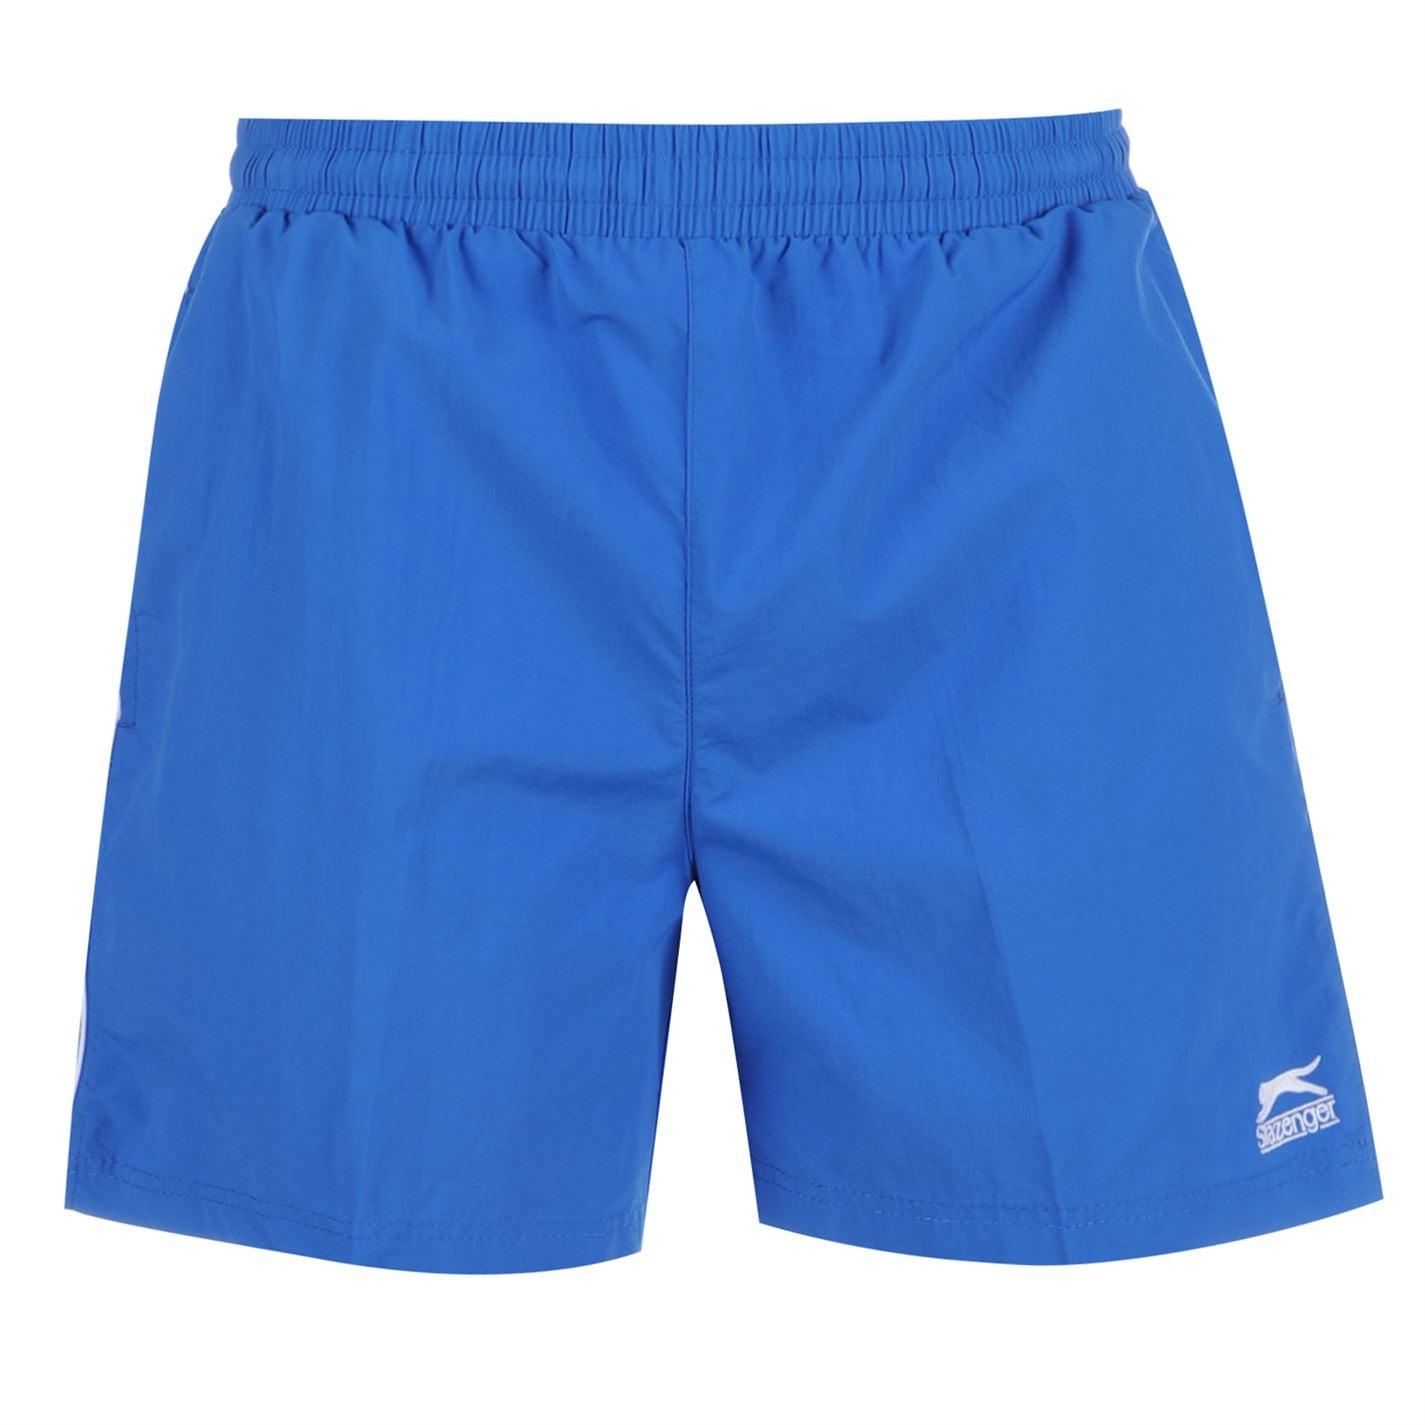 Pantaloni scurti inot Slazenger pentru Barbati albastru